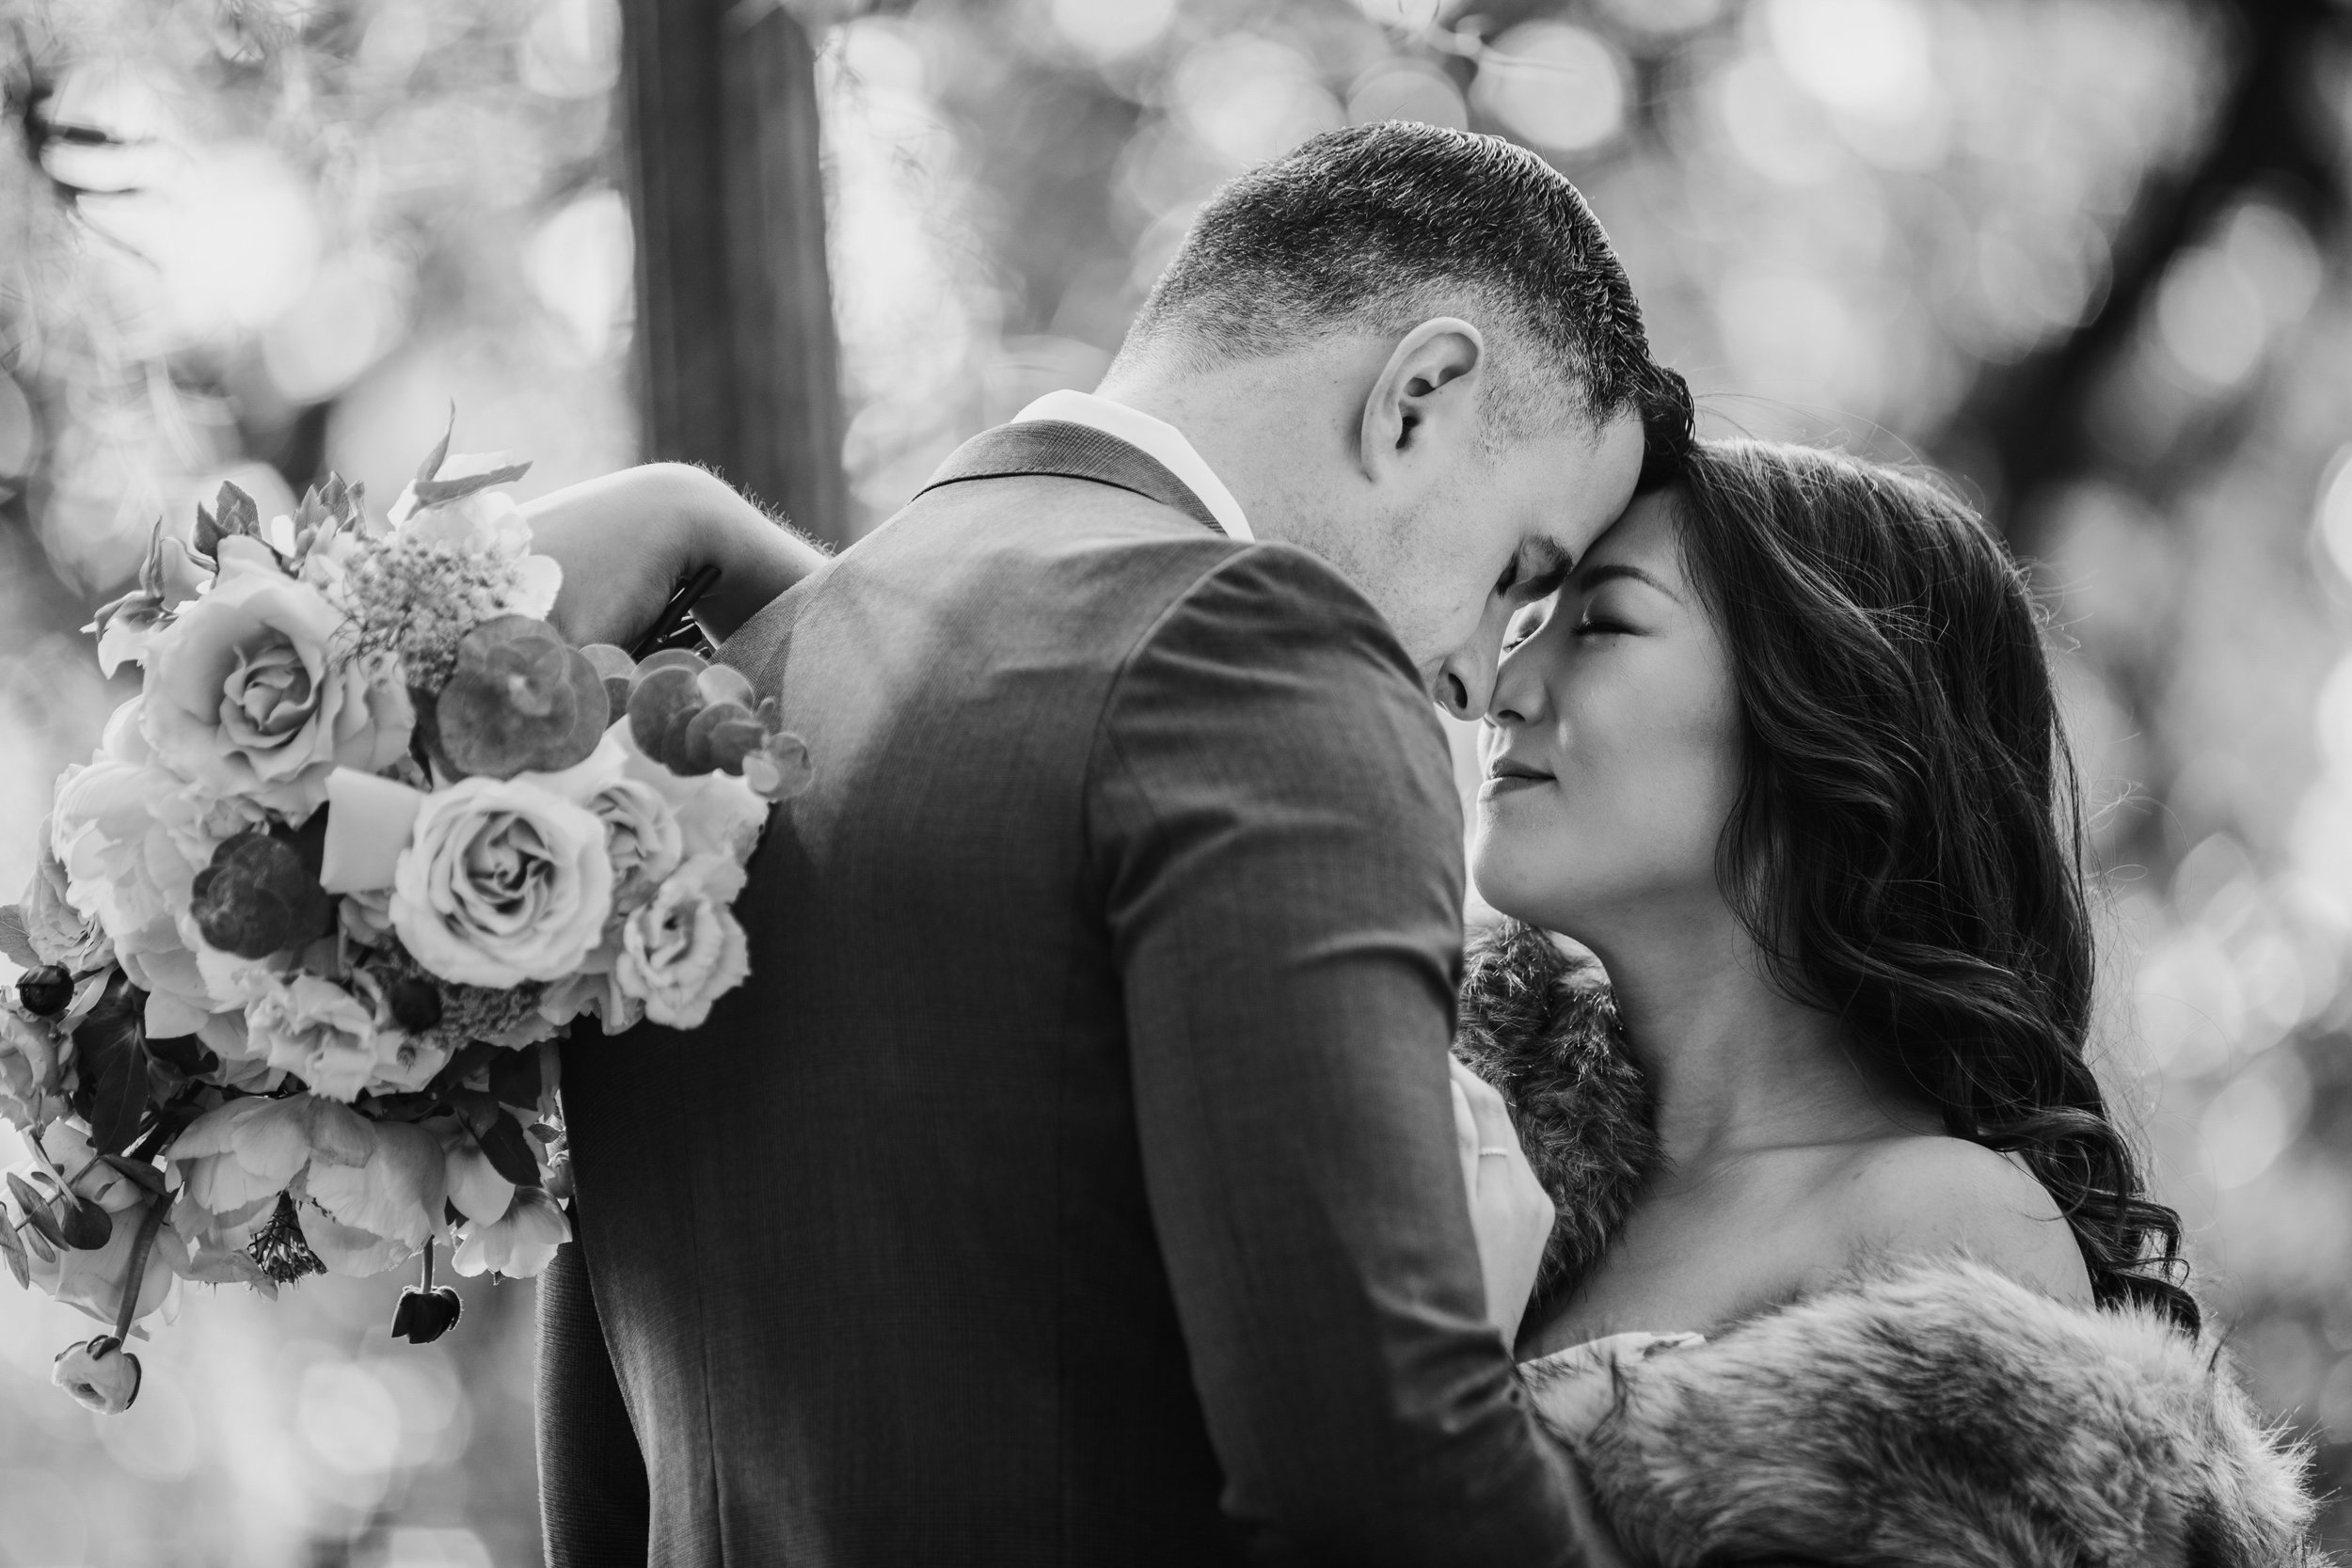 City Park Elopement New Orleans Wedding Photographer Ashley Biltz Photography23.jpg